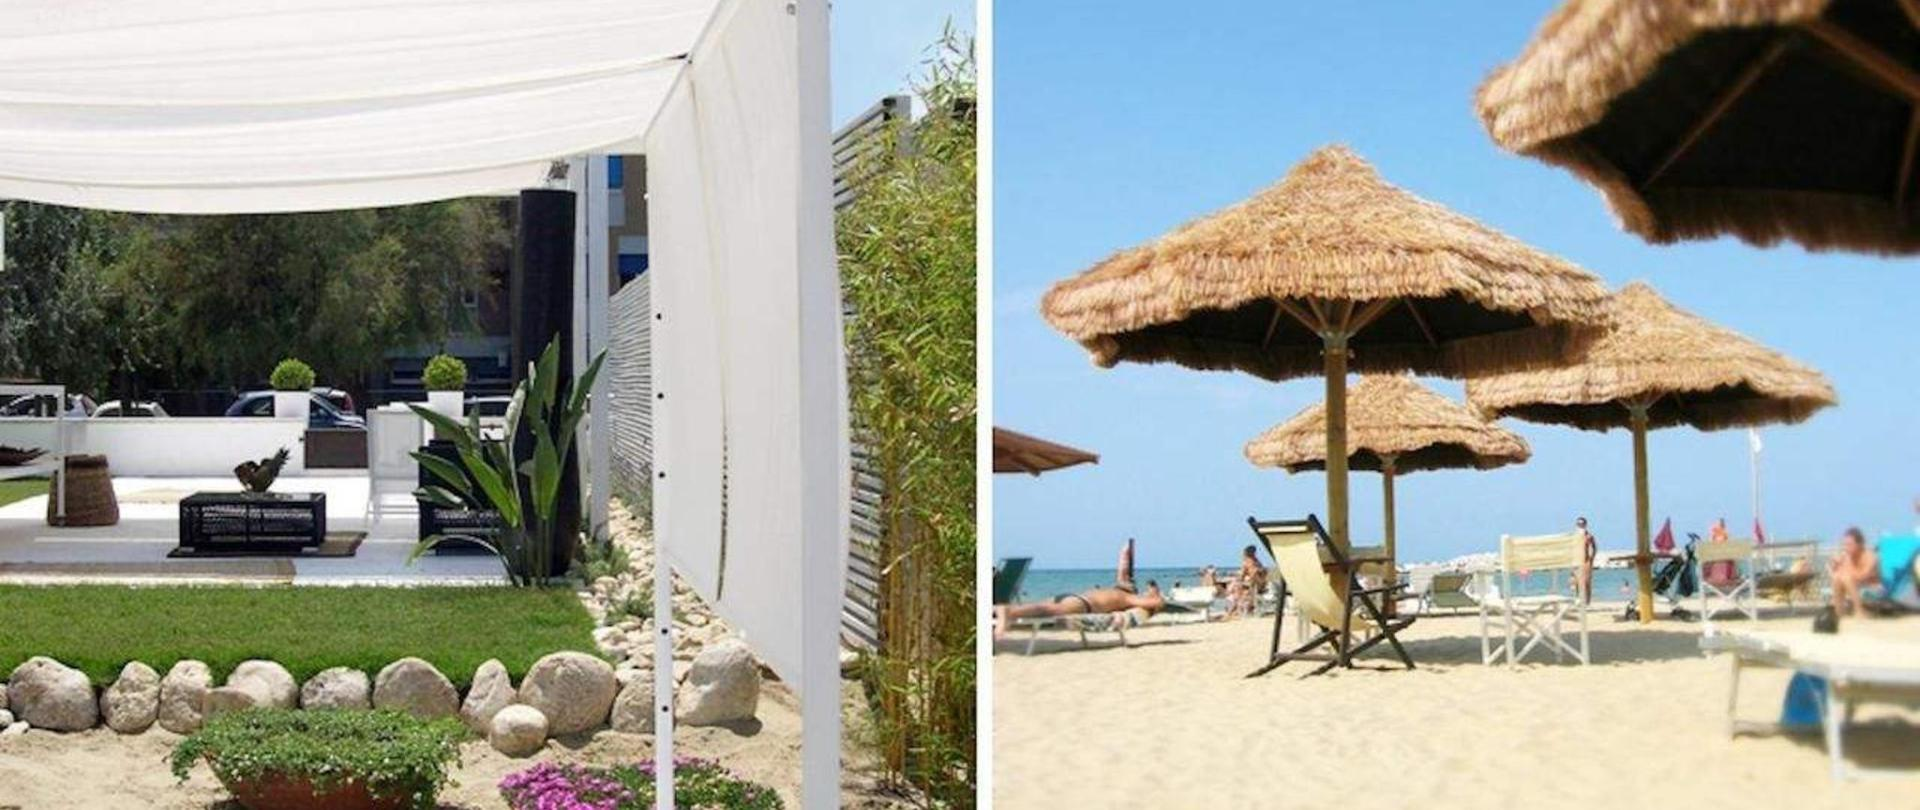 Pescara Strand hotel salus pescara italy